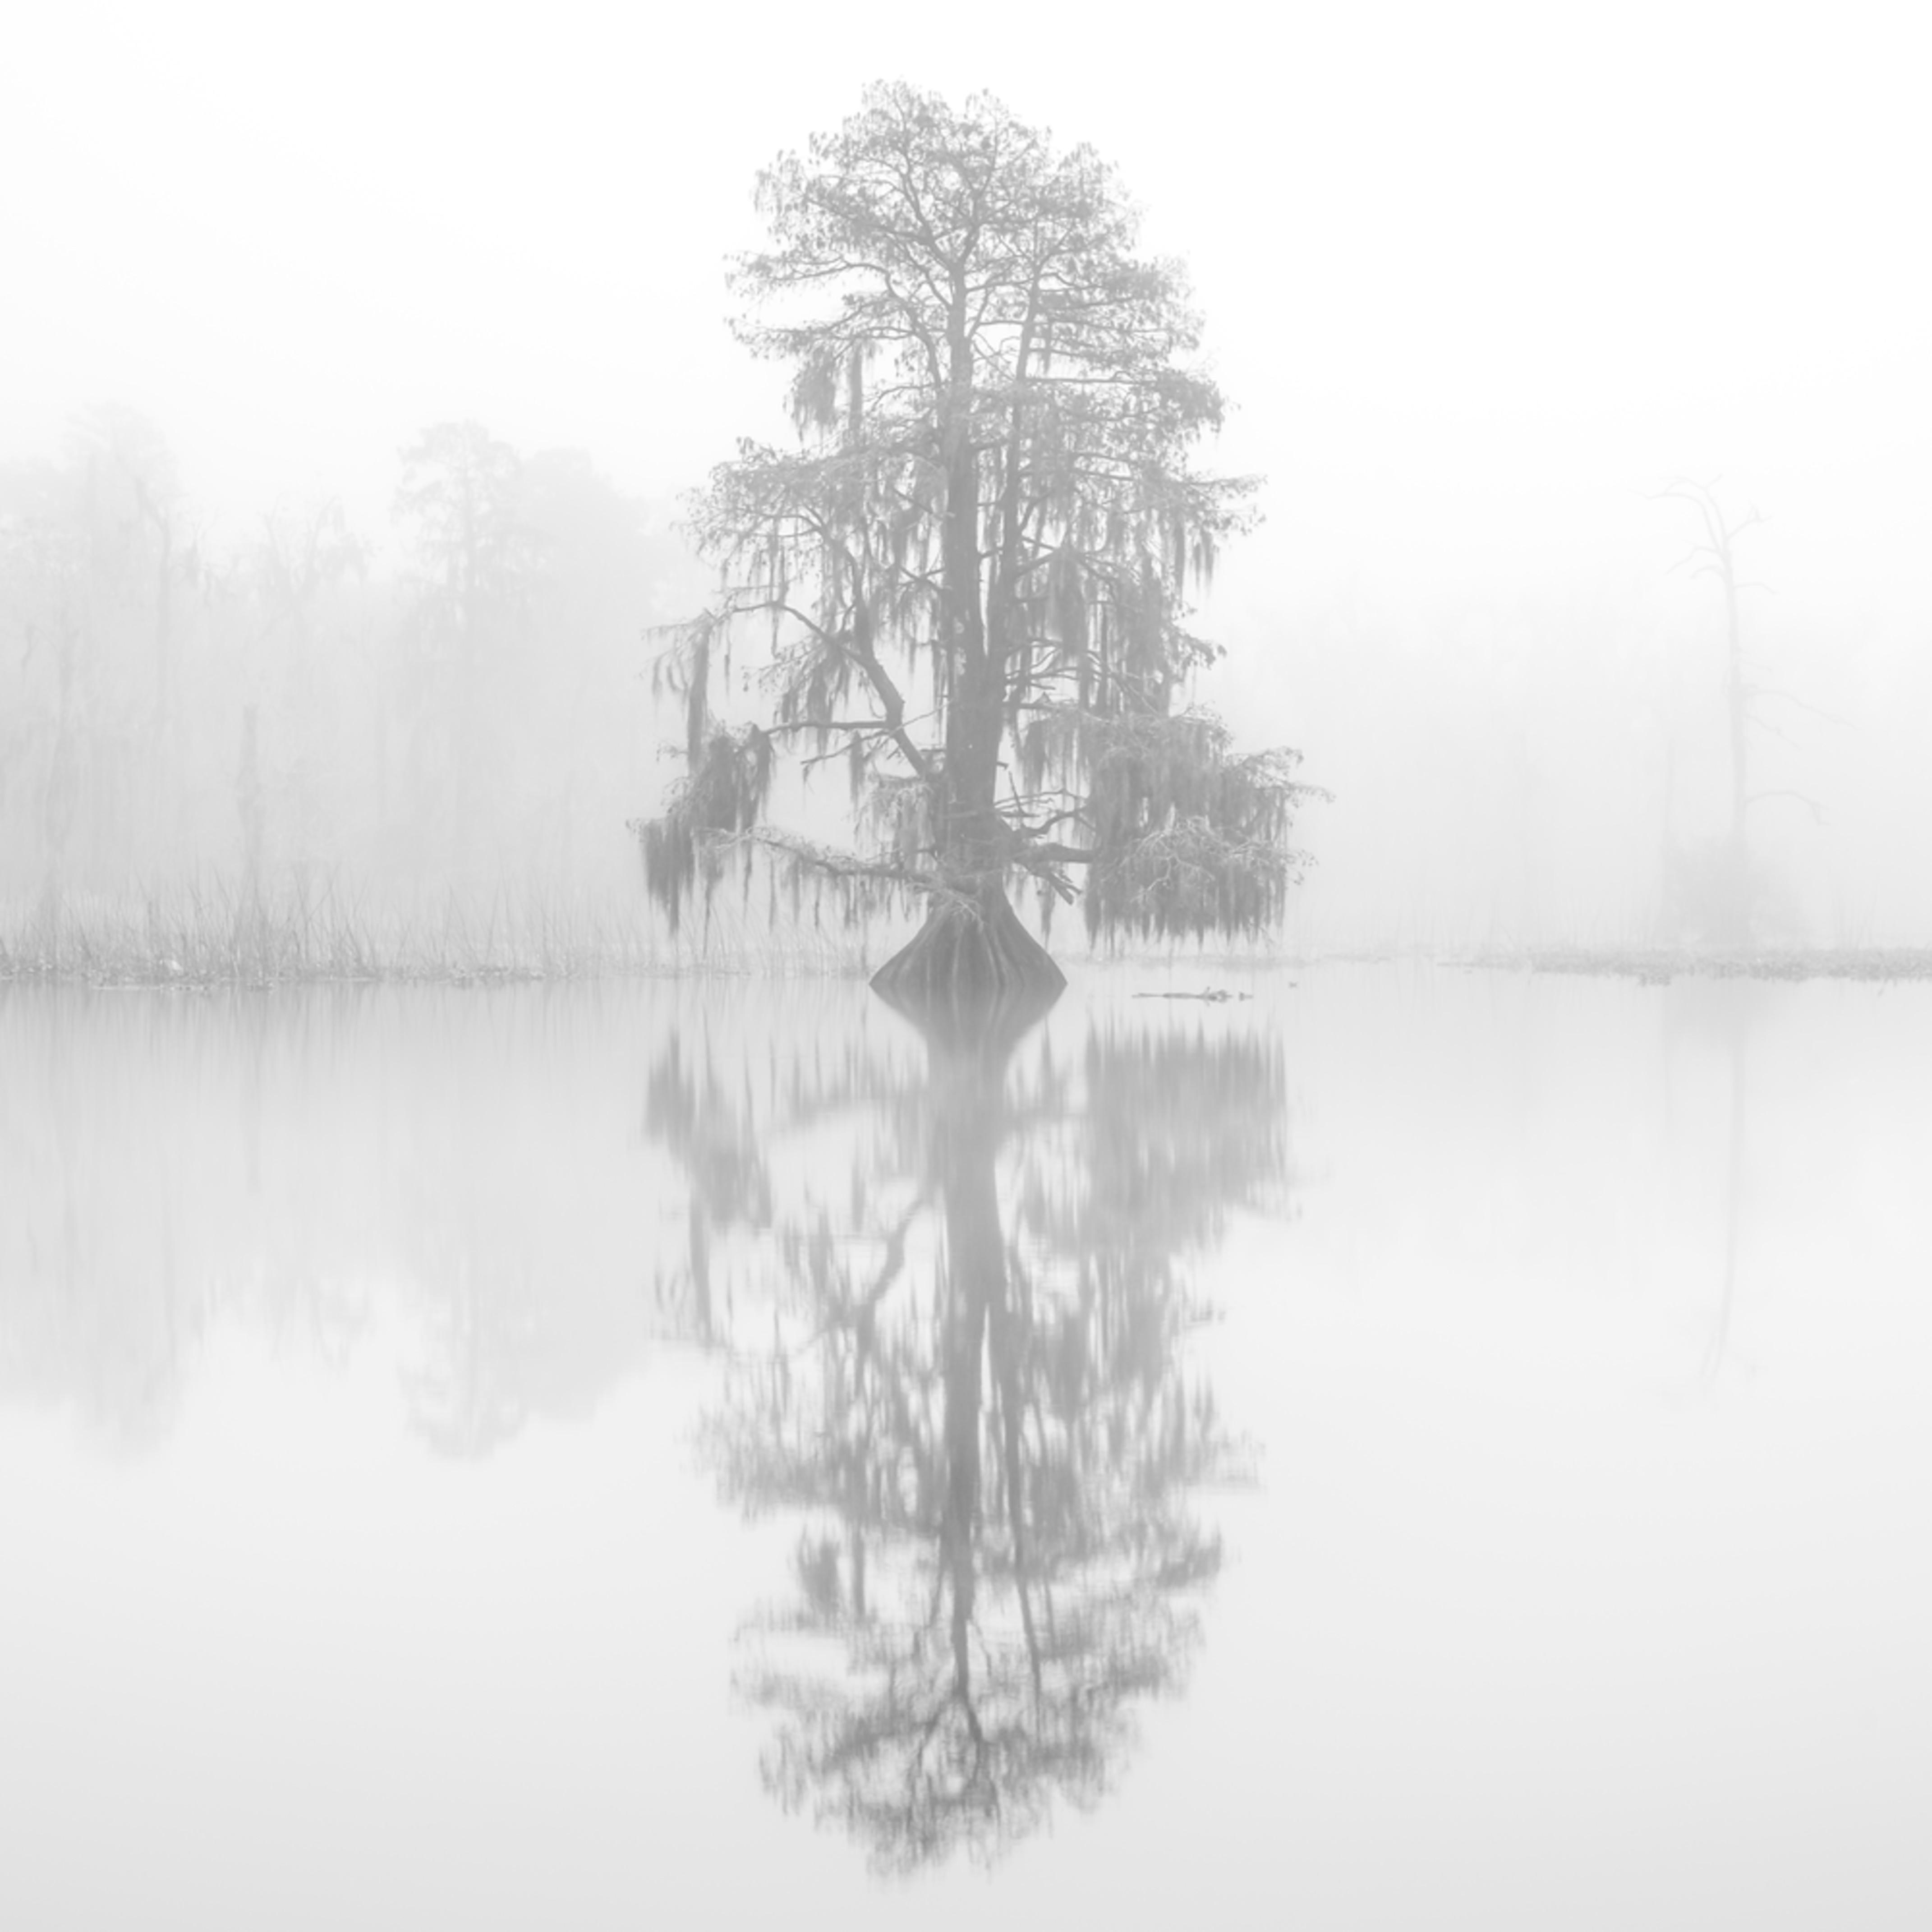 Andy crawford photography maurepas swamp 20171219 6 fyimz8